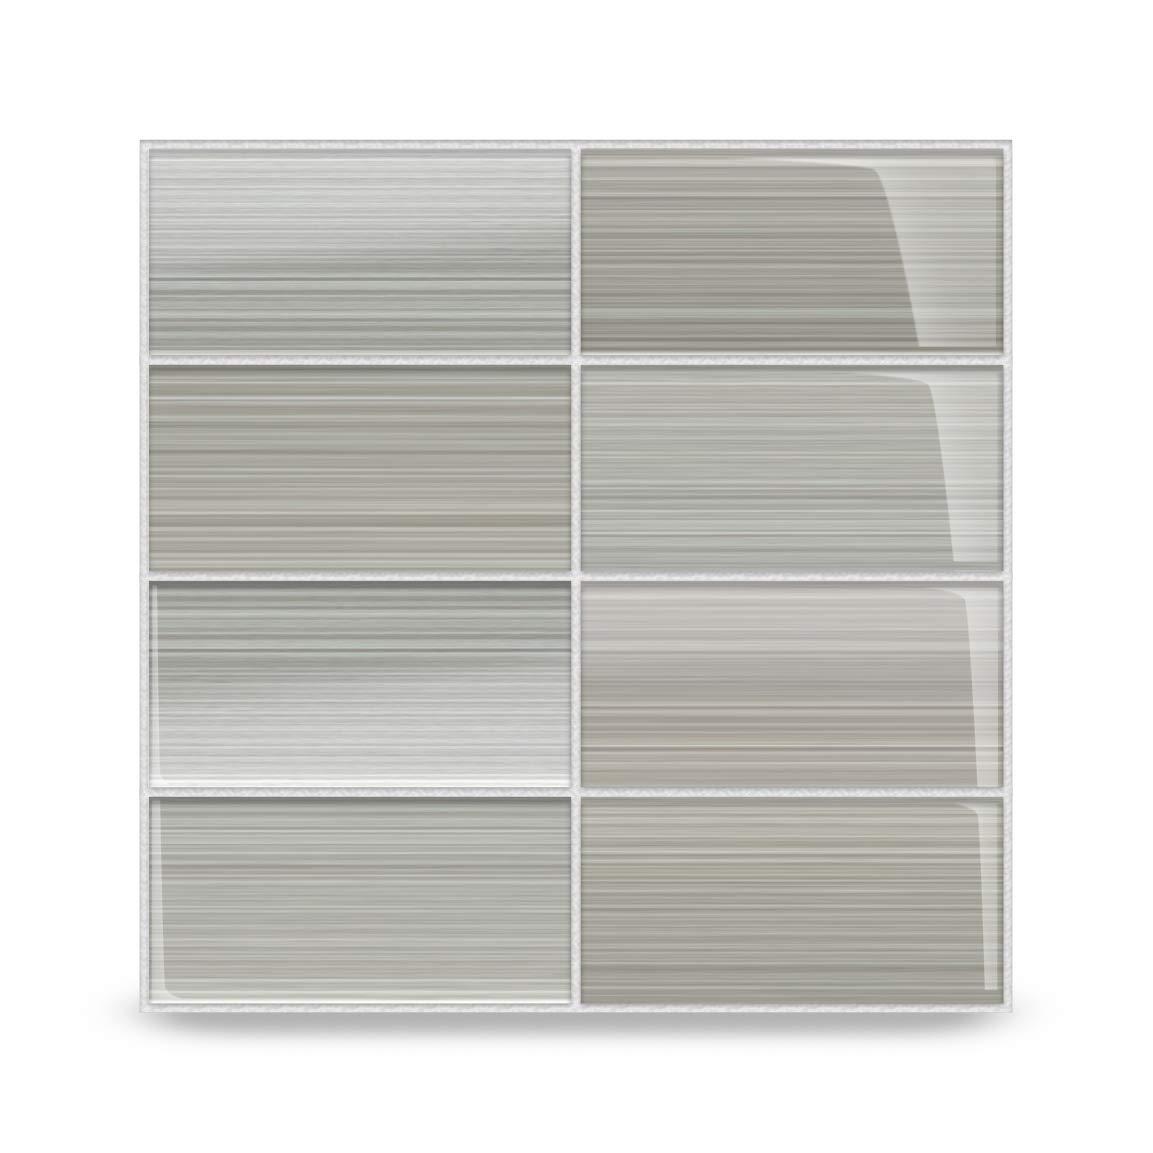 - Gray Glass Subway Tile Gainsboro For Kitchen Backsplash Or